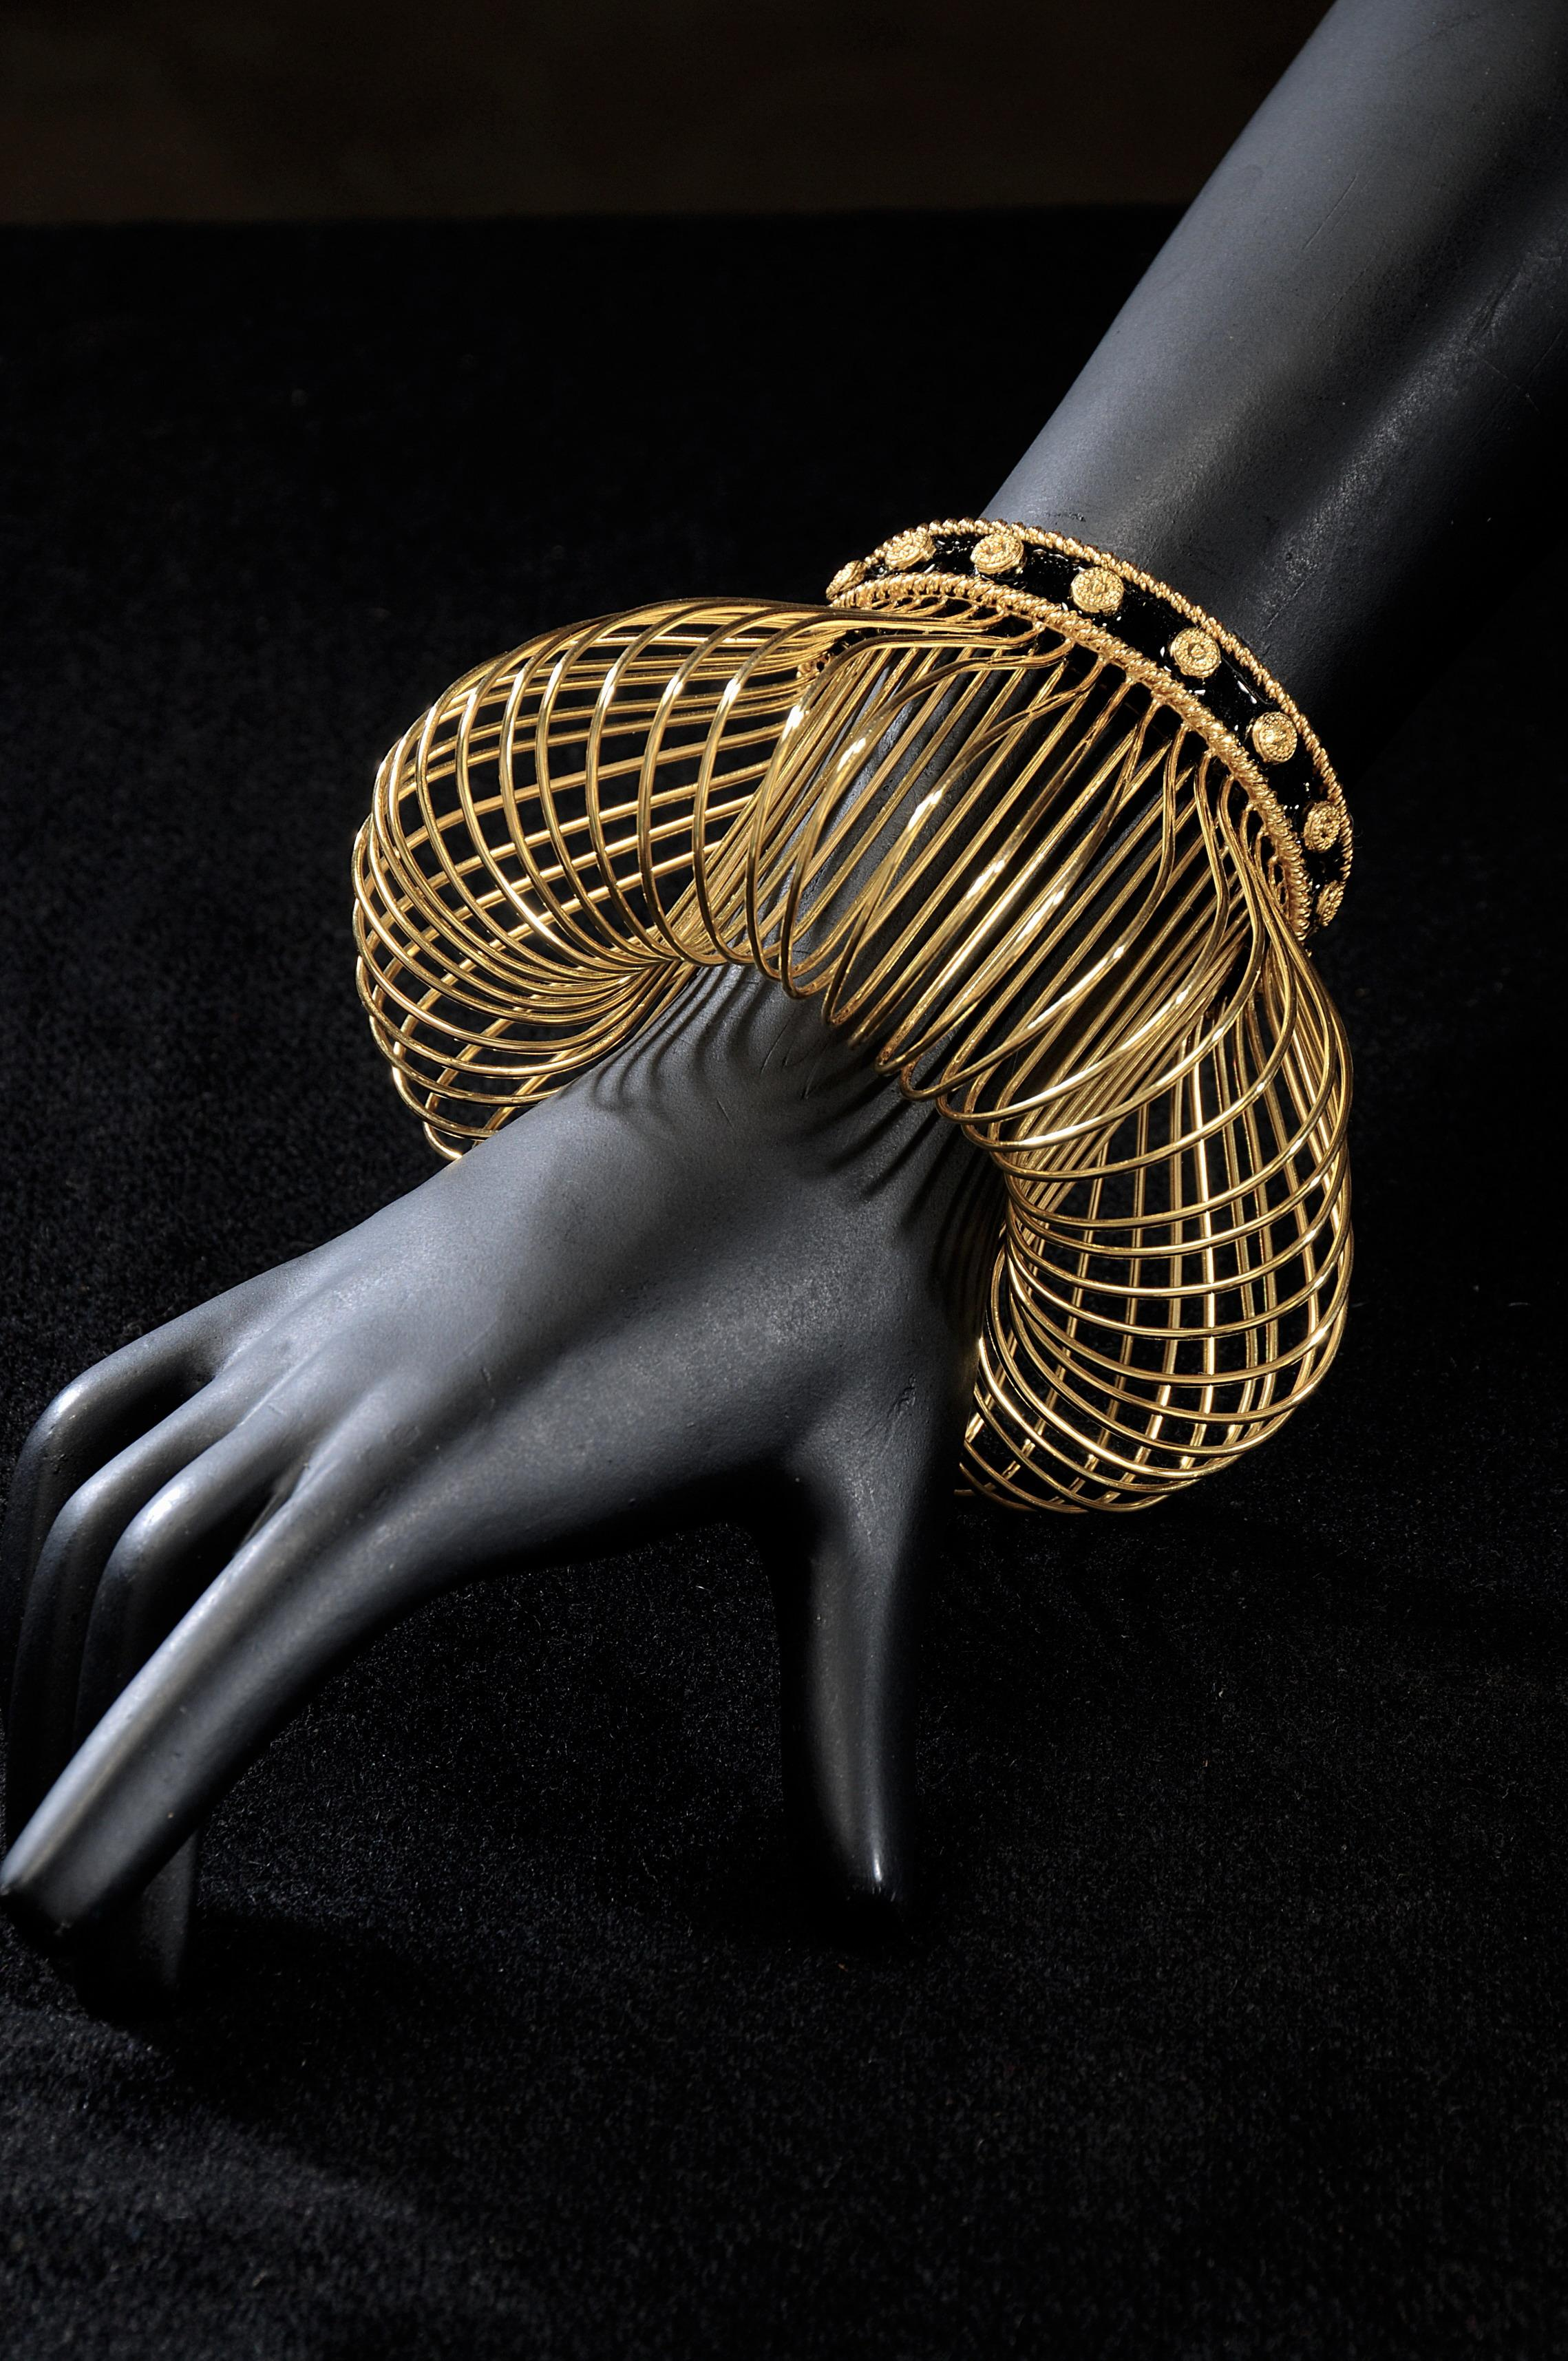 Hktdc Com Quot Best Of The Best Quot Jewellery Design